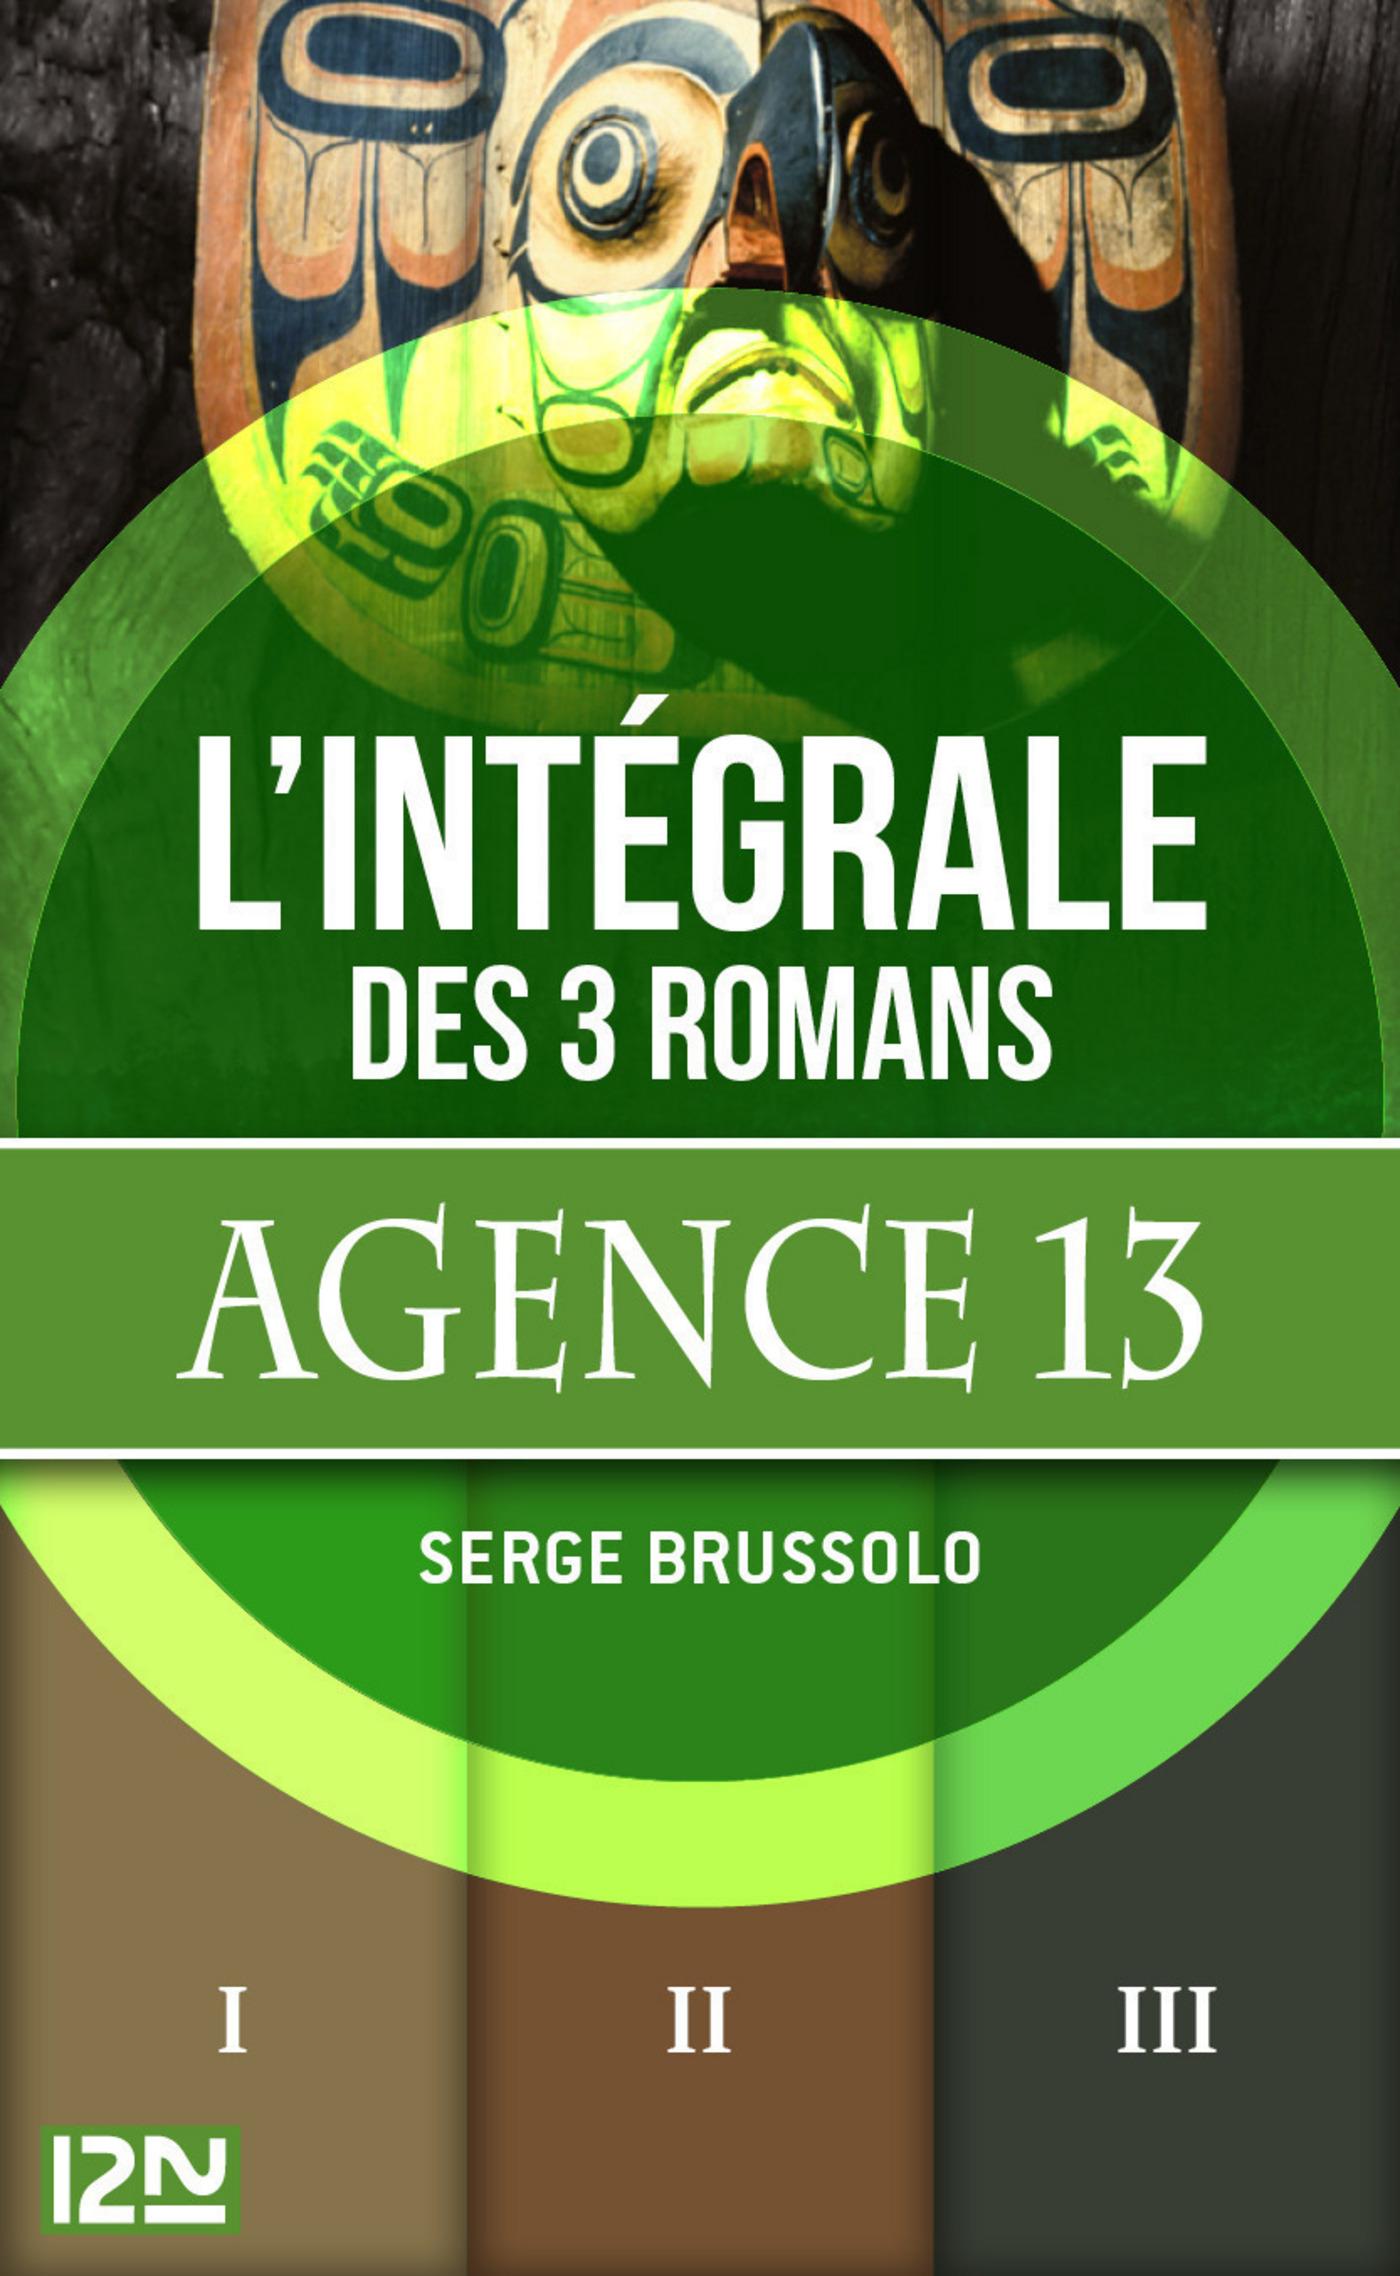 Intégrale Agence 13